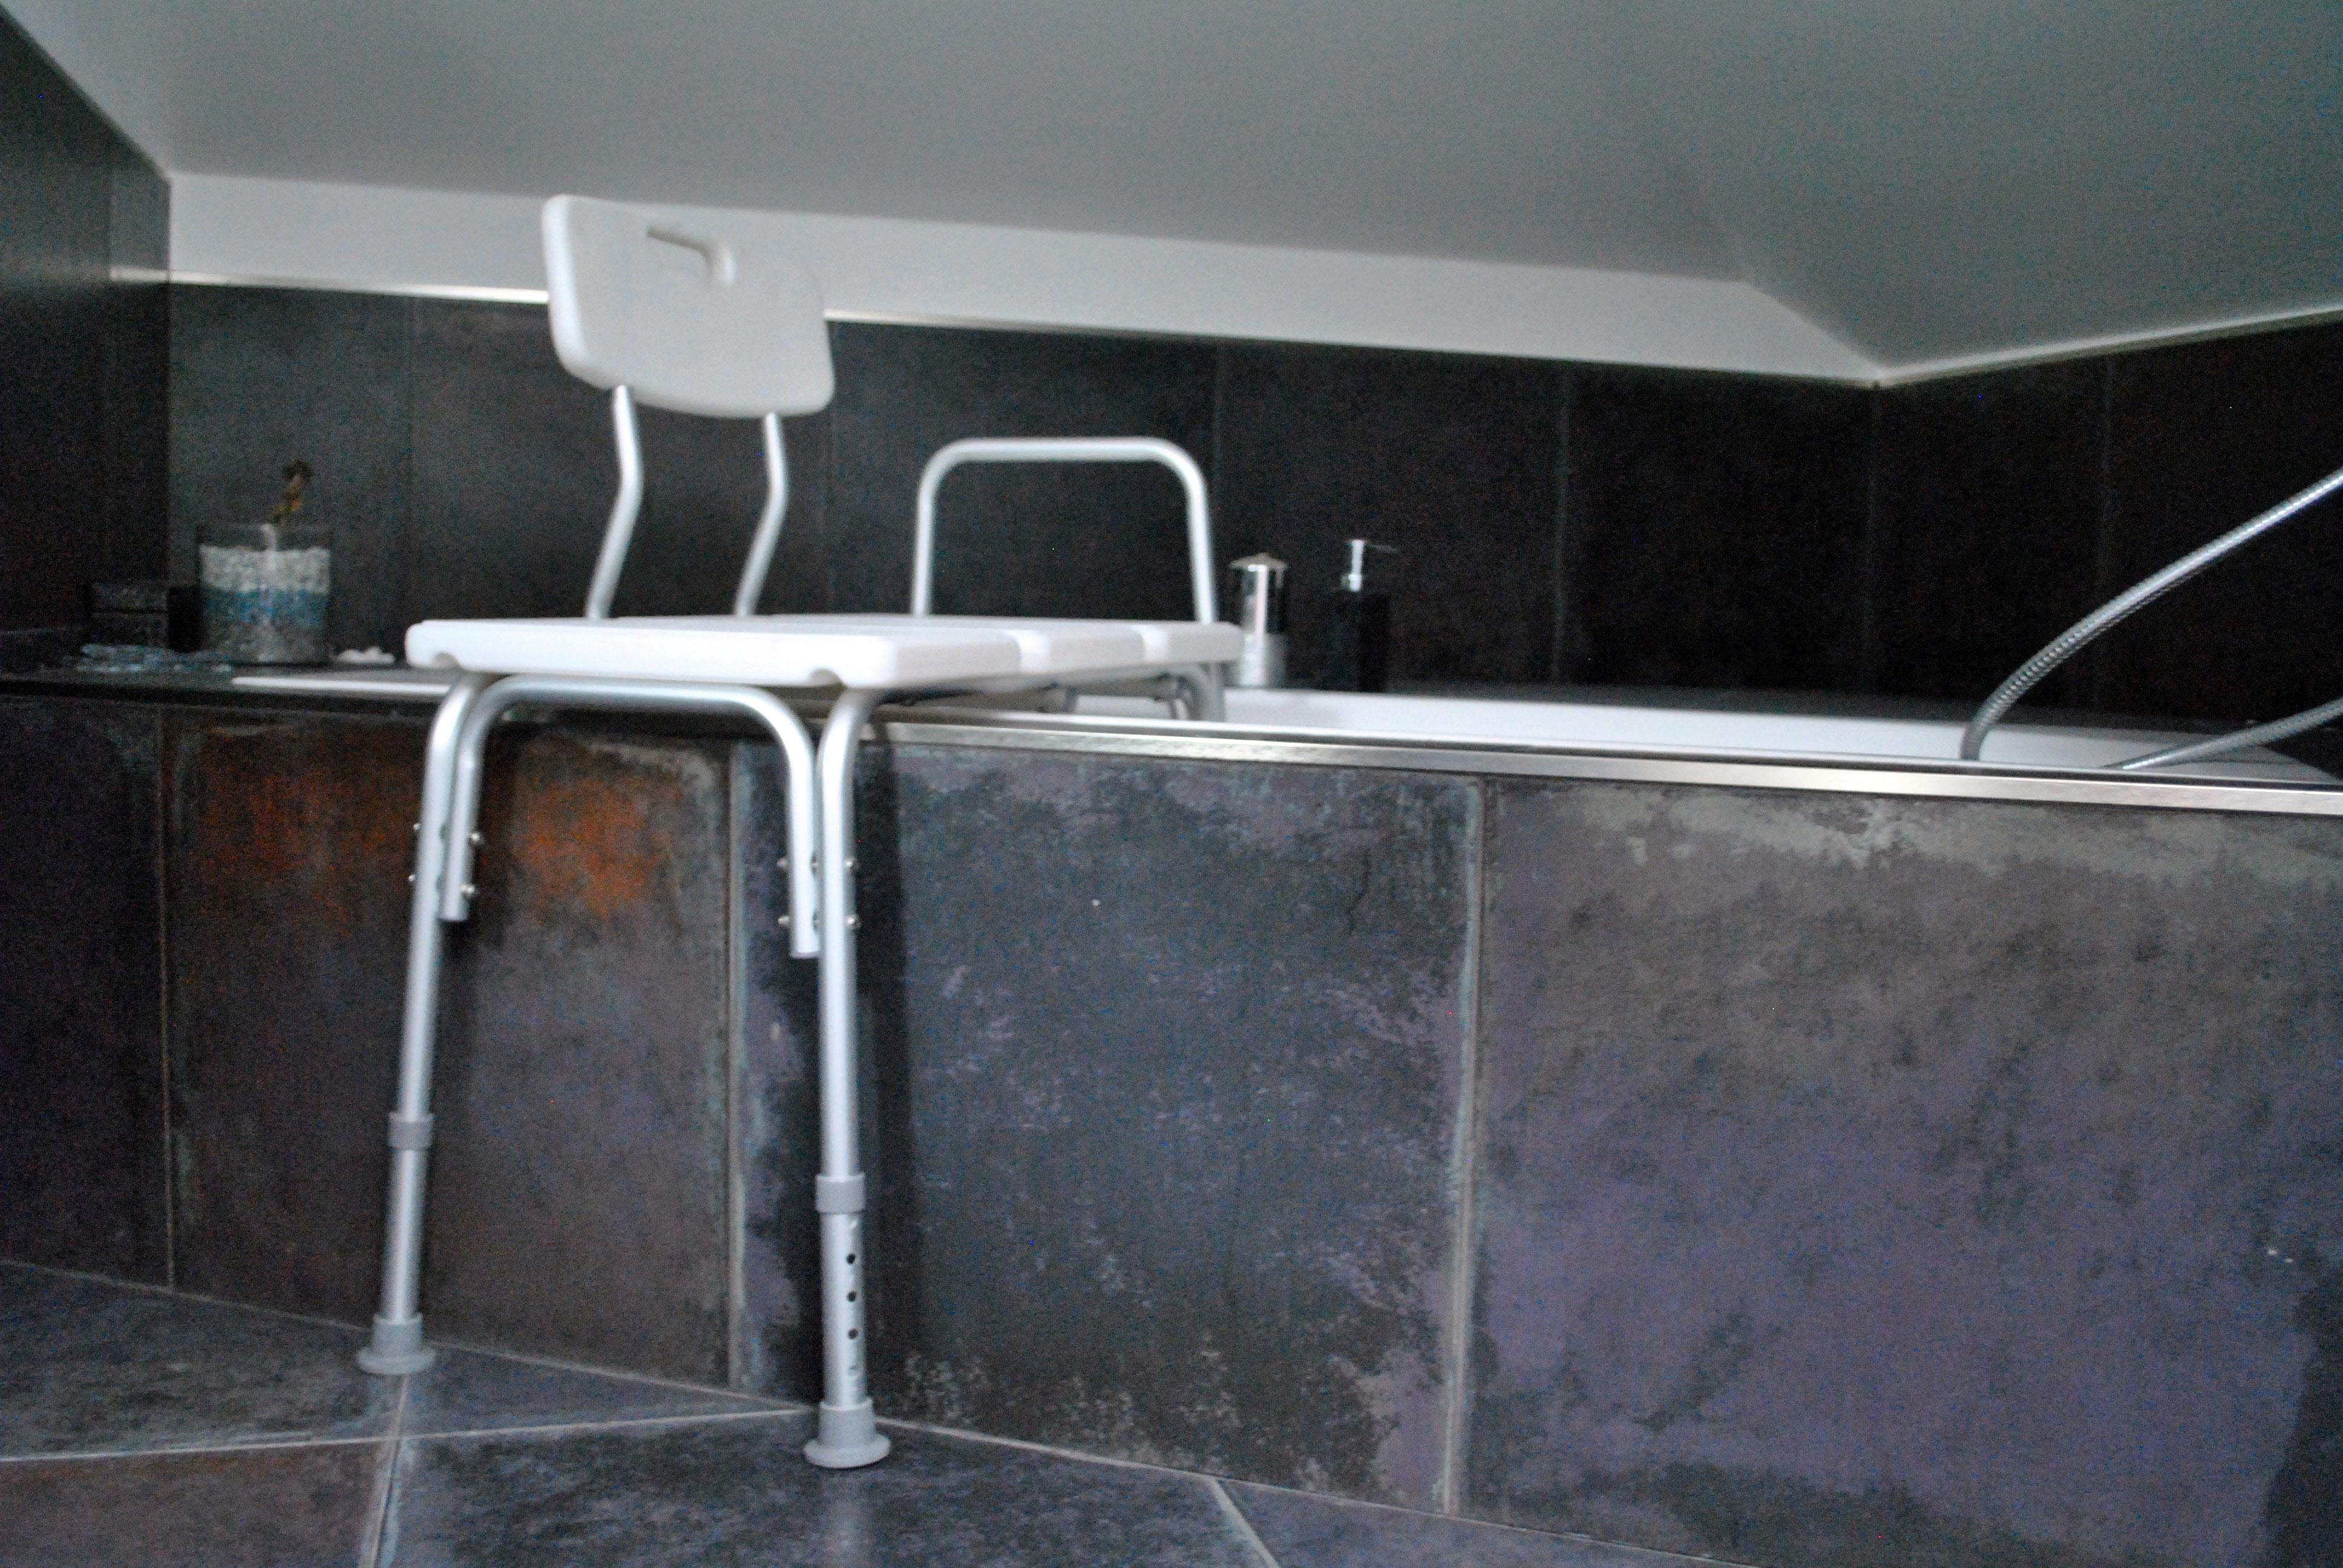 Vasca Da Bagno Per Esterno : Vasca per esterno prezzi finest elegant vasca posti prezzo